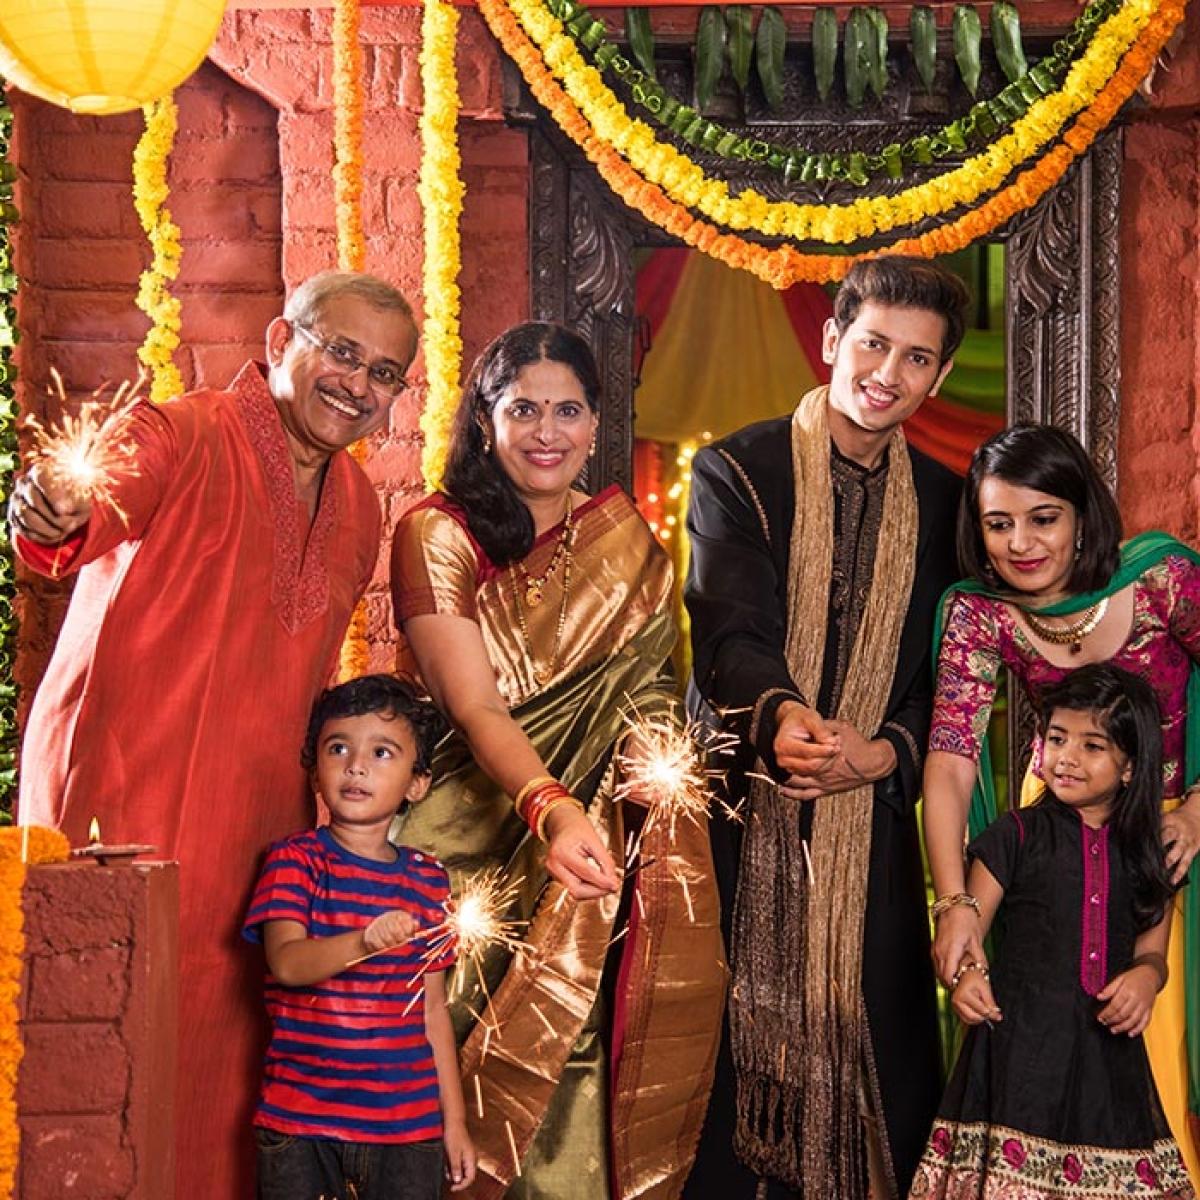 Happy Children's Day & Happy Diwali: Boys clean, Girls shoot; goodbye to gender bias in 2020